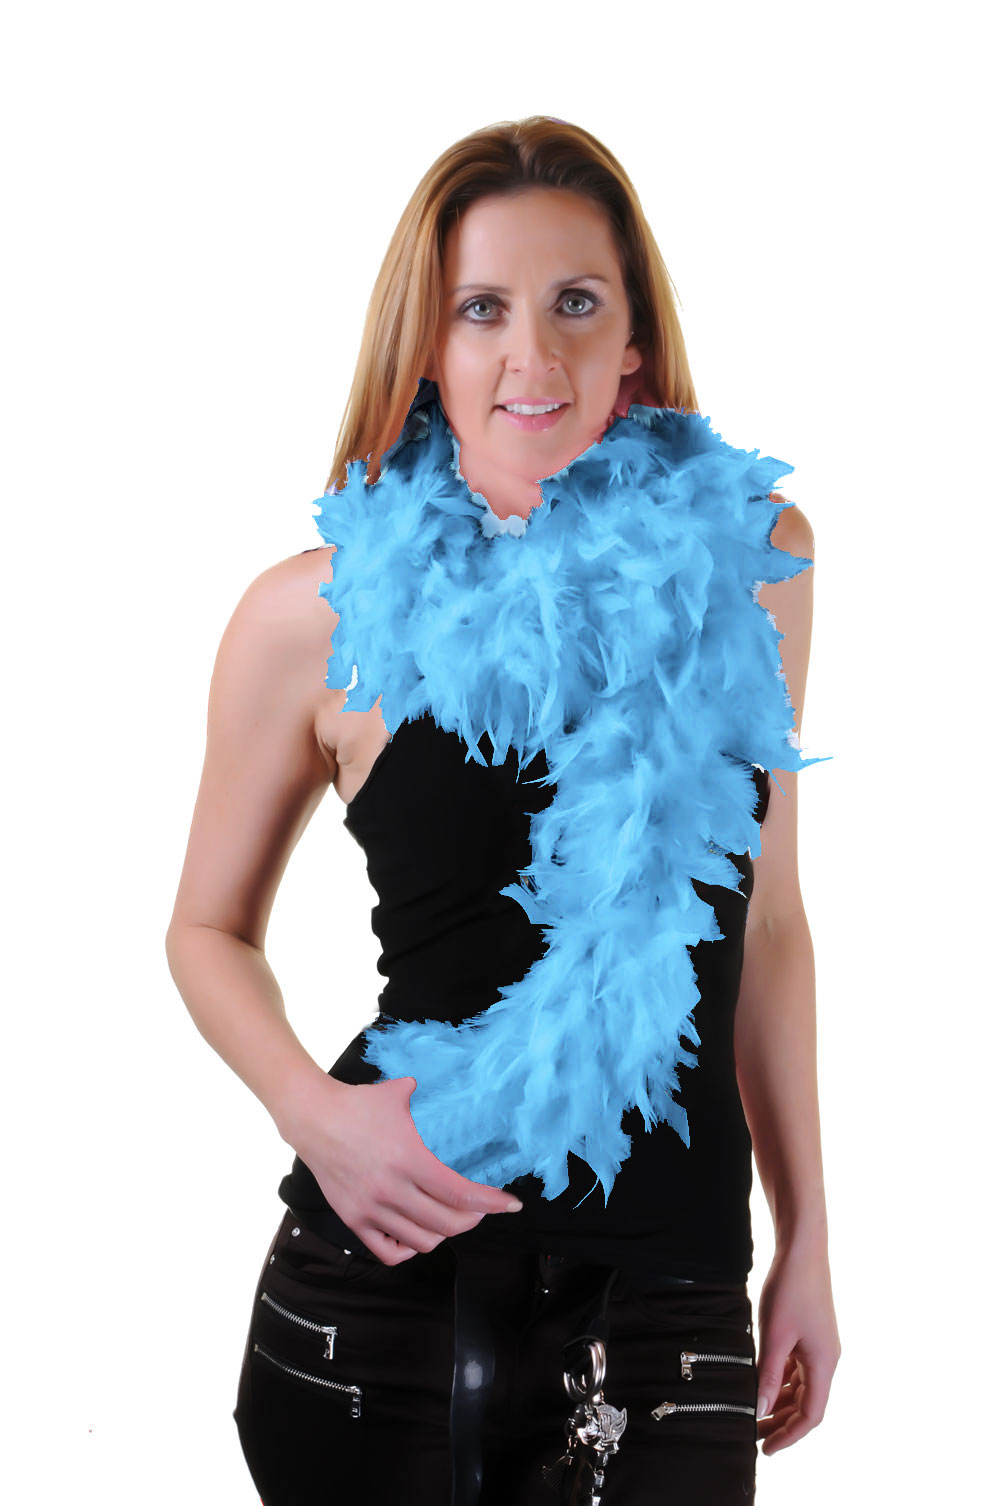 Sky Blue Feather Boa High Quality